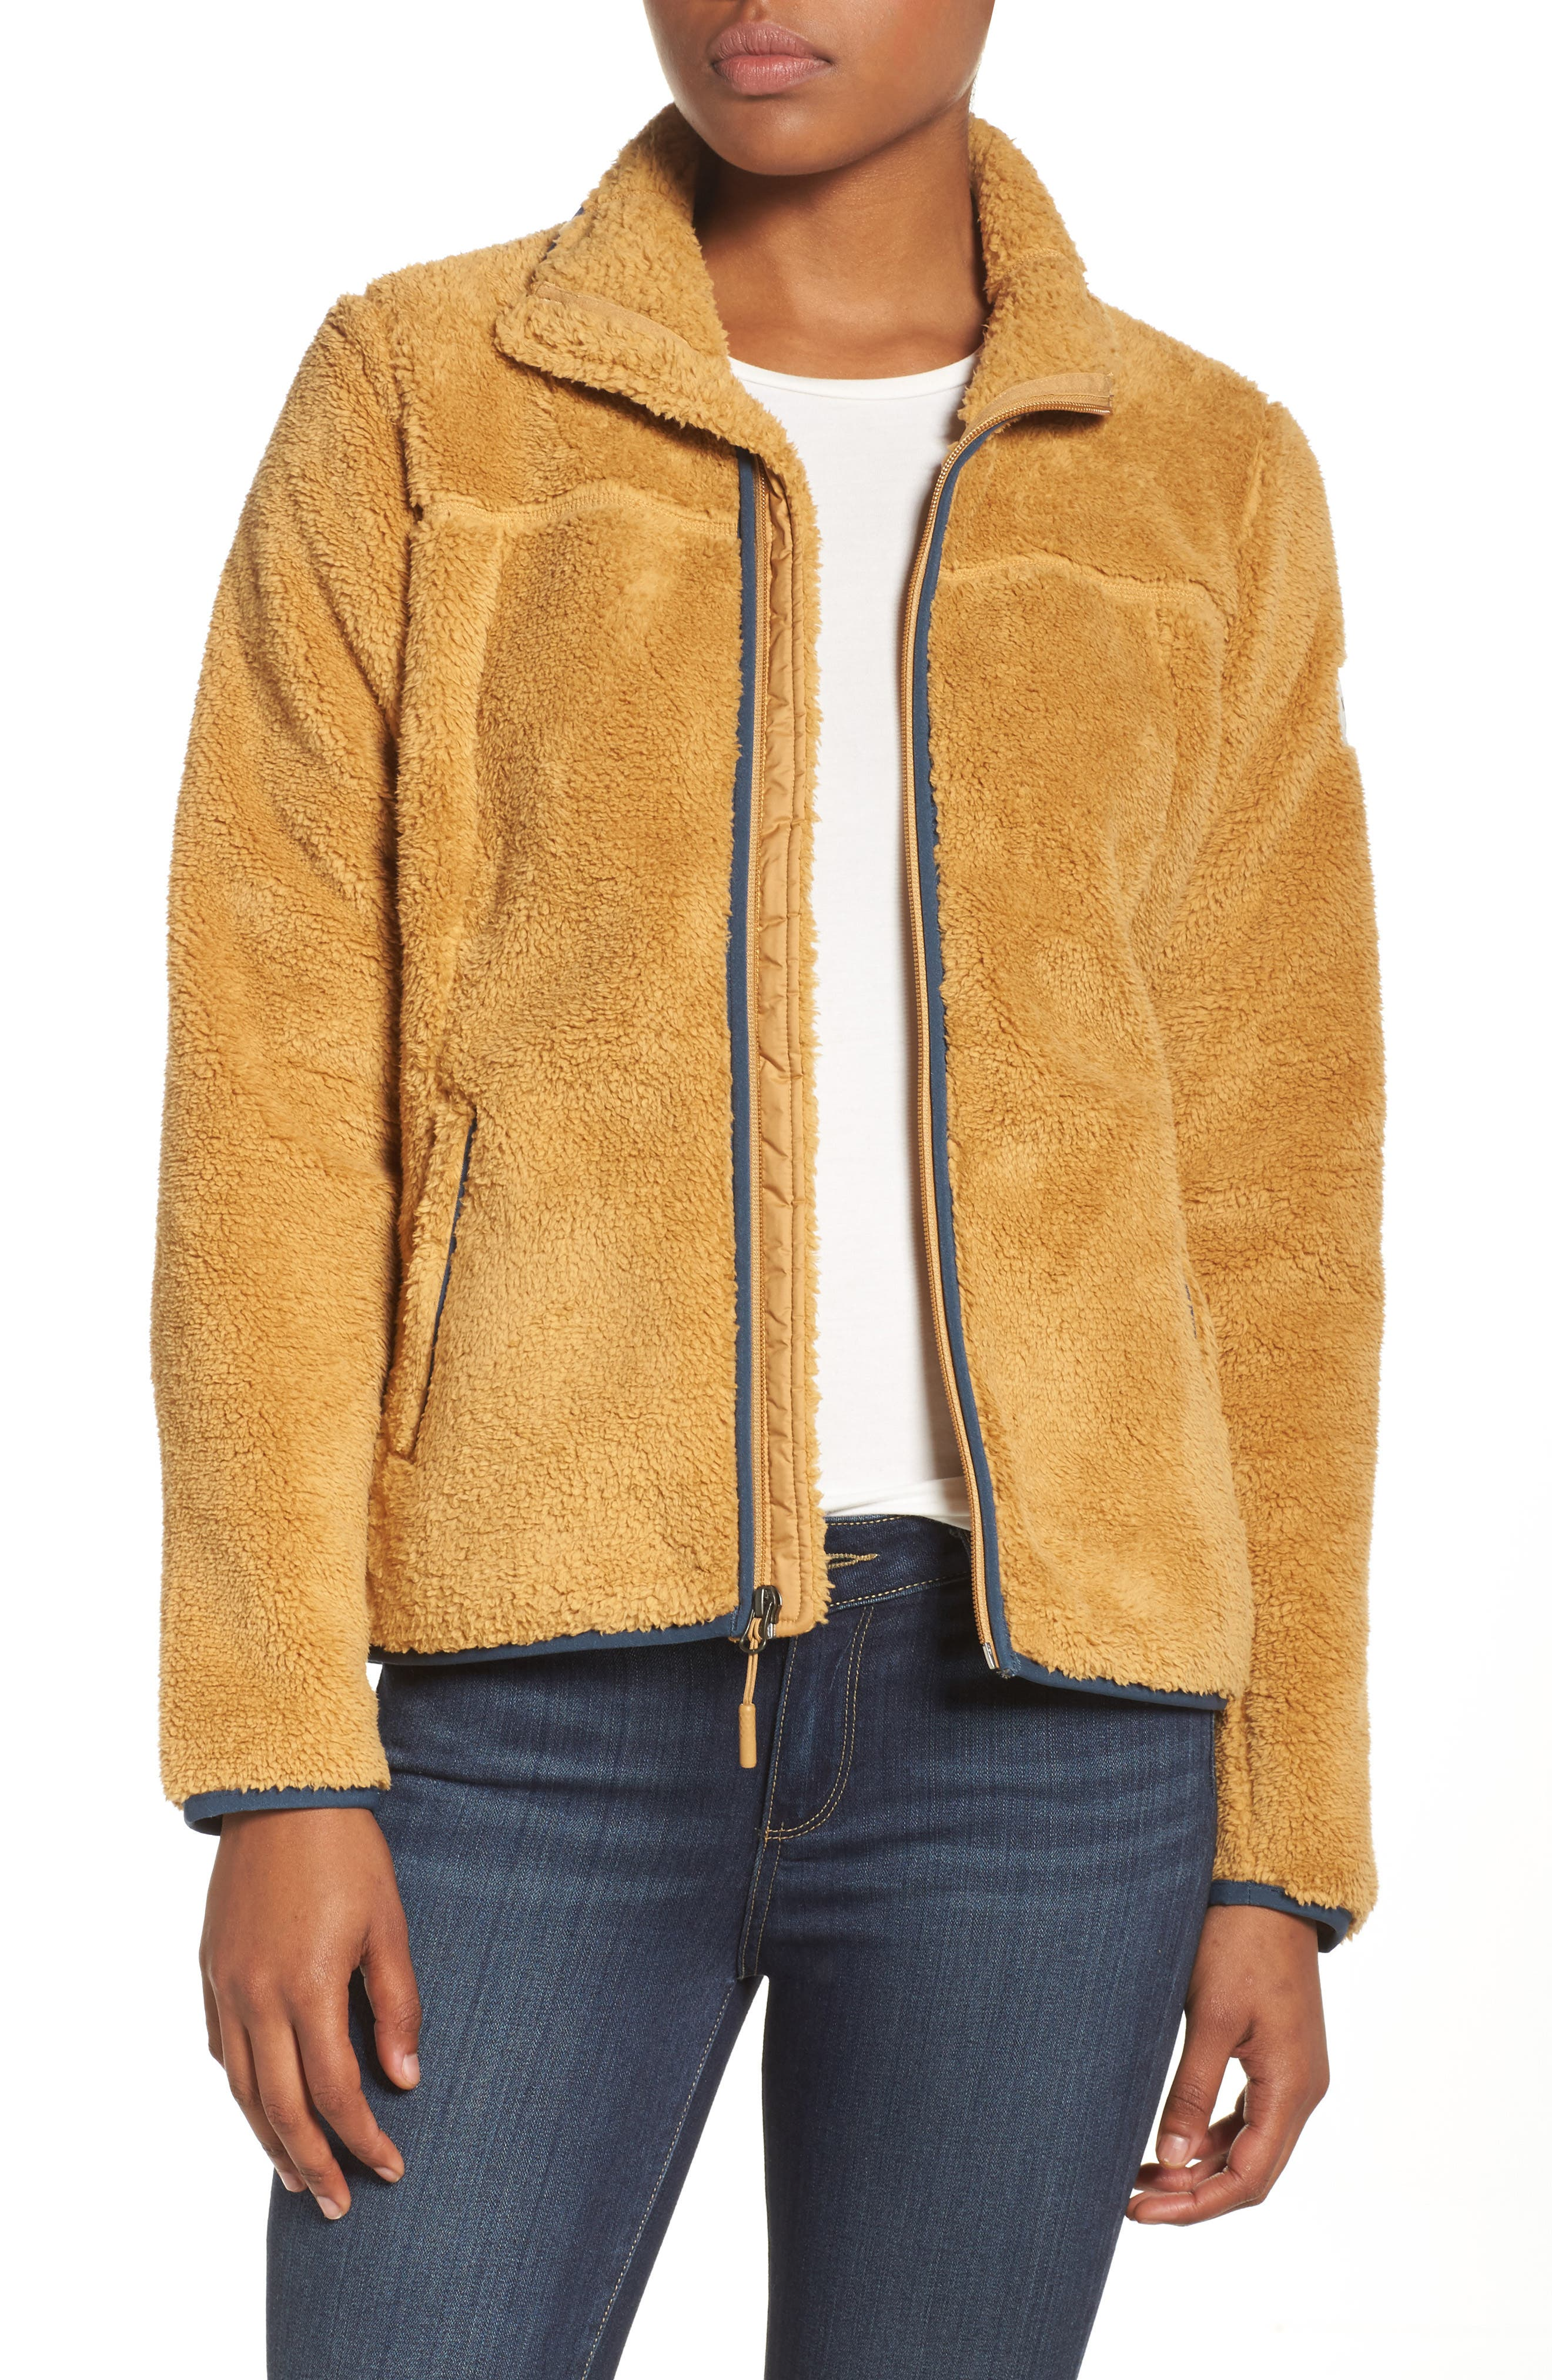 Campshire Zip Jacket,                             Main thumbnail 1, color,                             Biscuit Tan